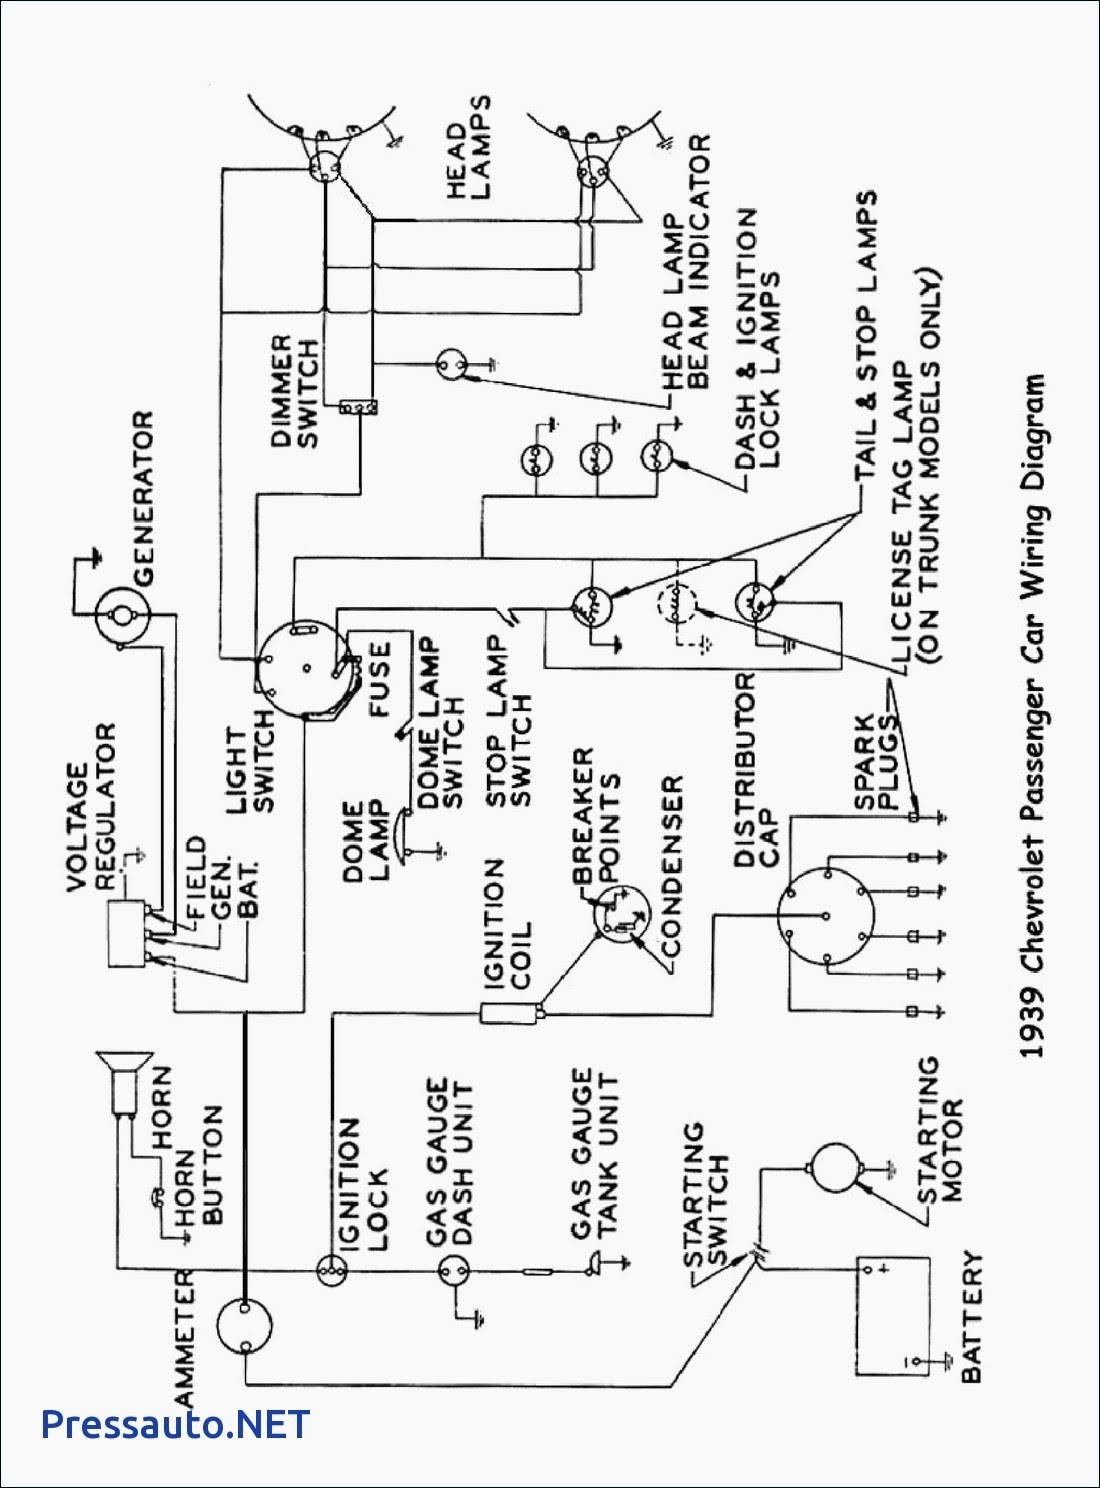 Wiring Diagram Database: John Deere 318 Ignition Switch